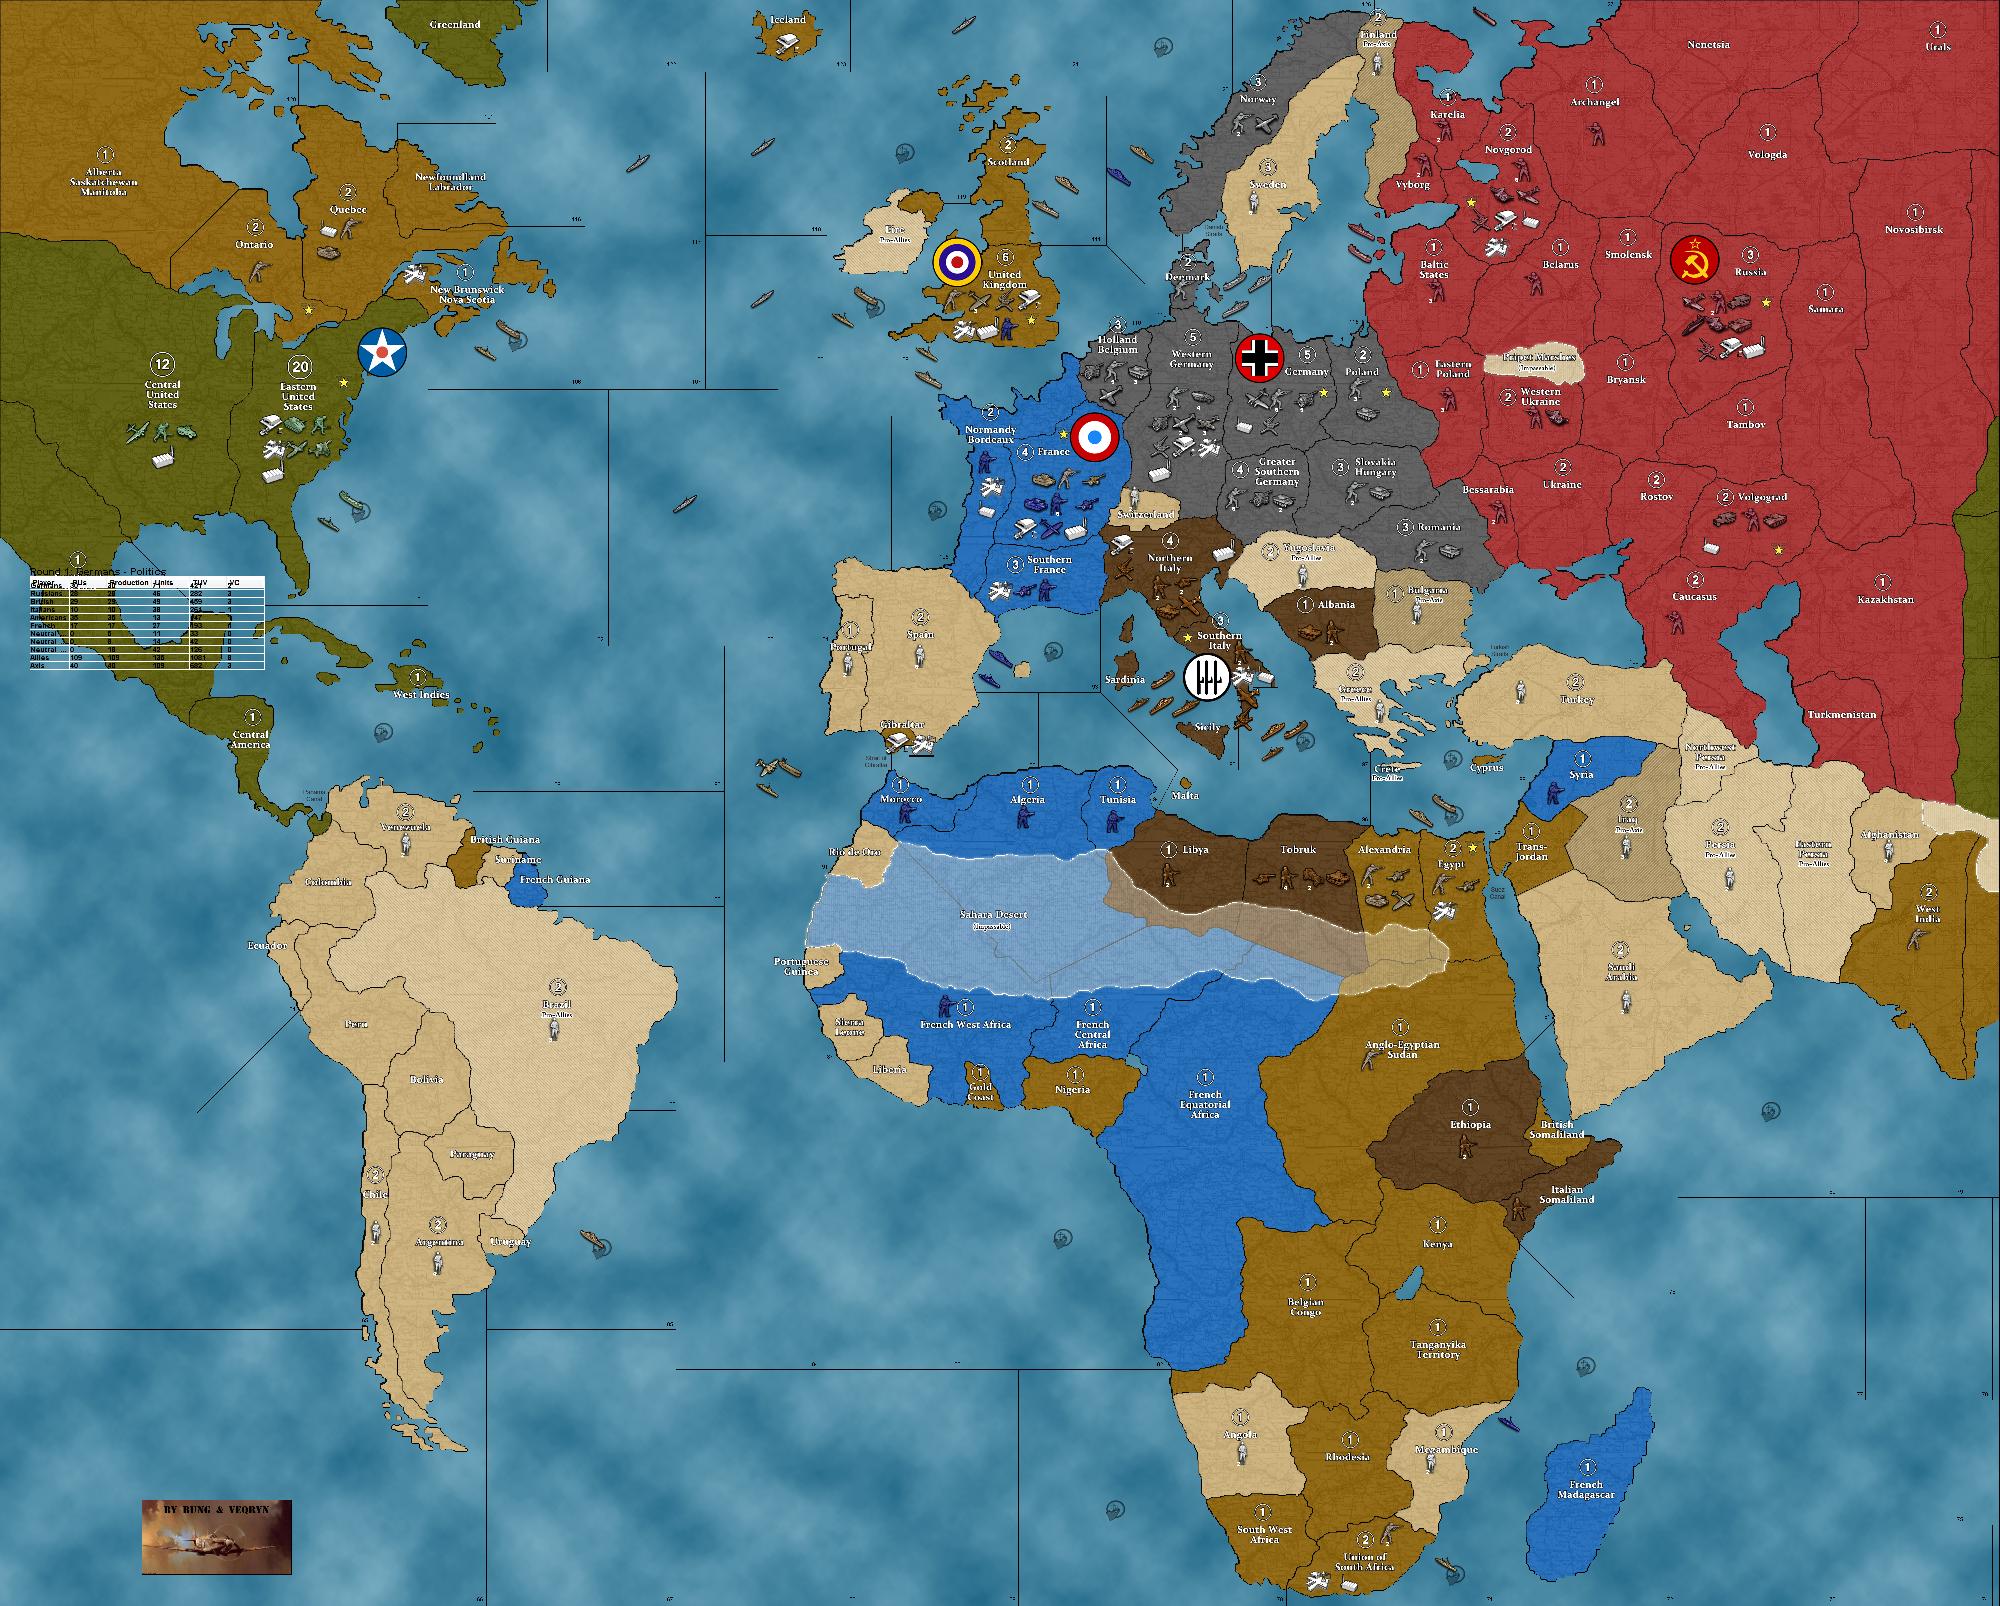 World War II Europe 1940 | Axis & Allies Wiki | FANDOM powered by Wikia